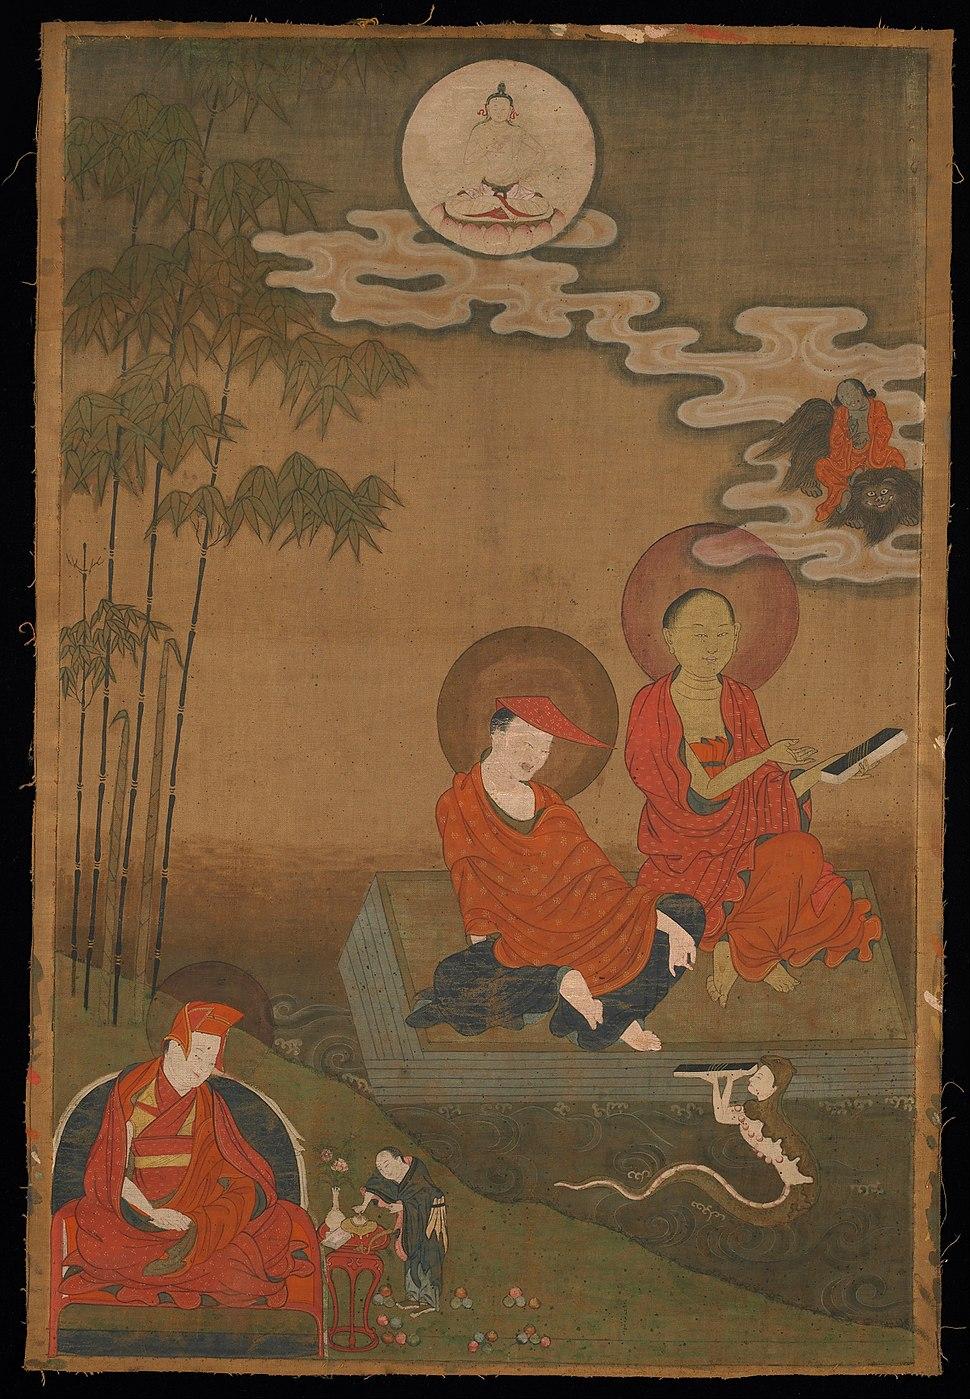 Nagarjuna and Aryadeva as Two Great Indian Buddhist Scholastics - Google Art Project